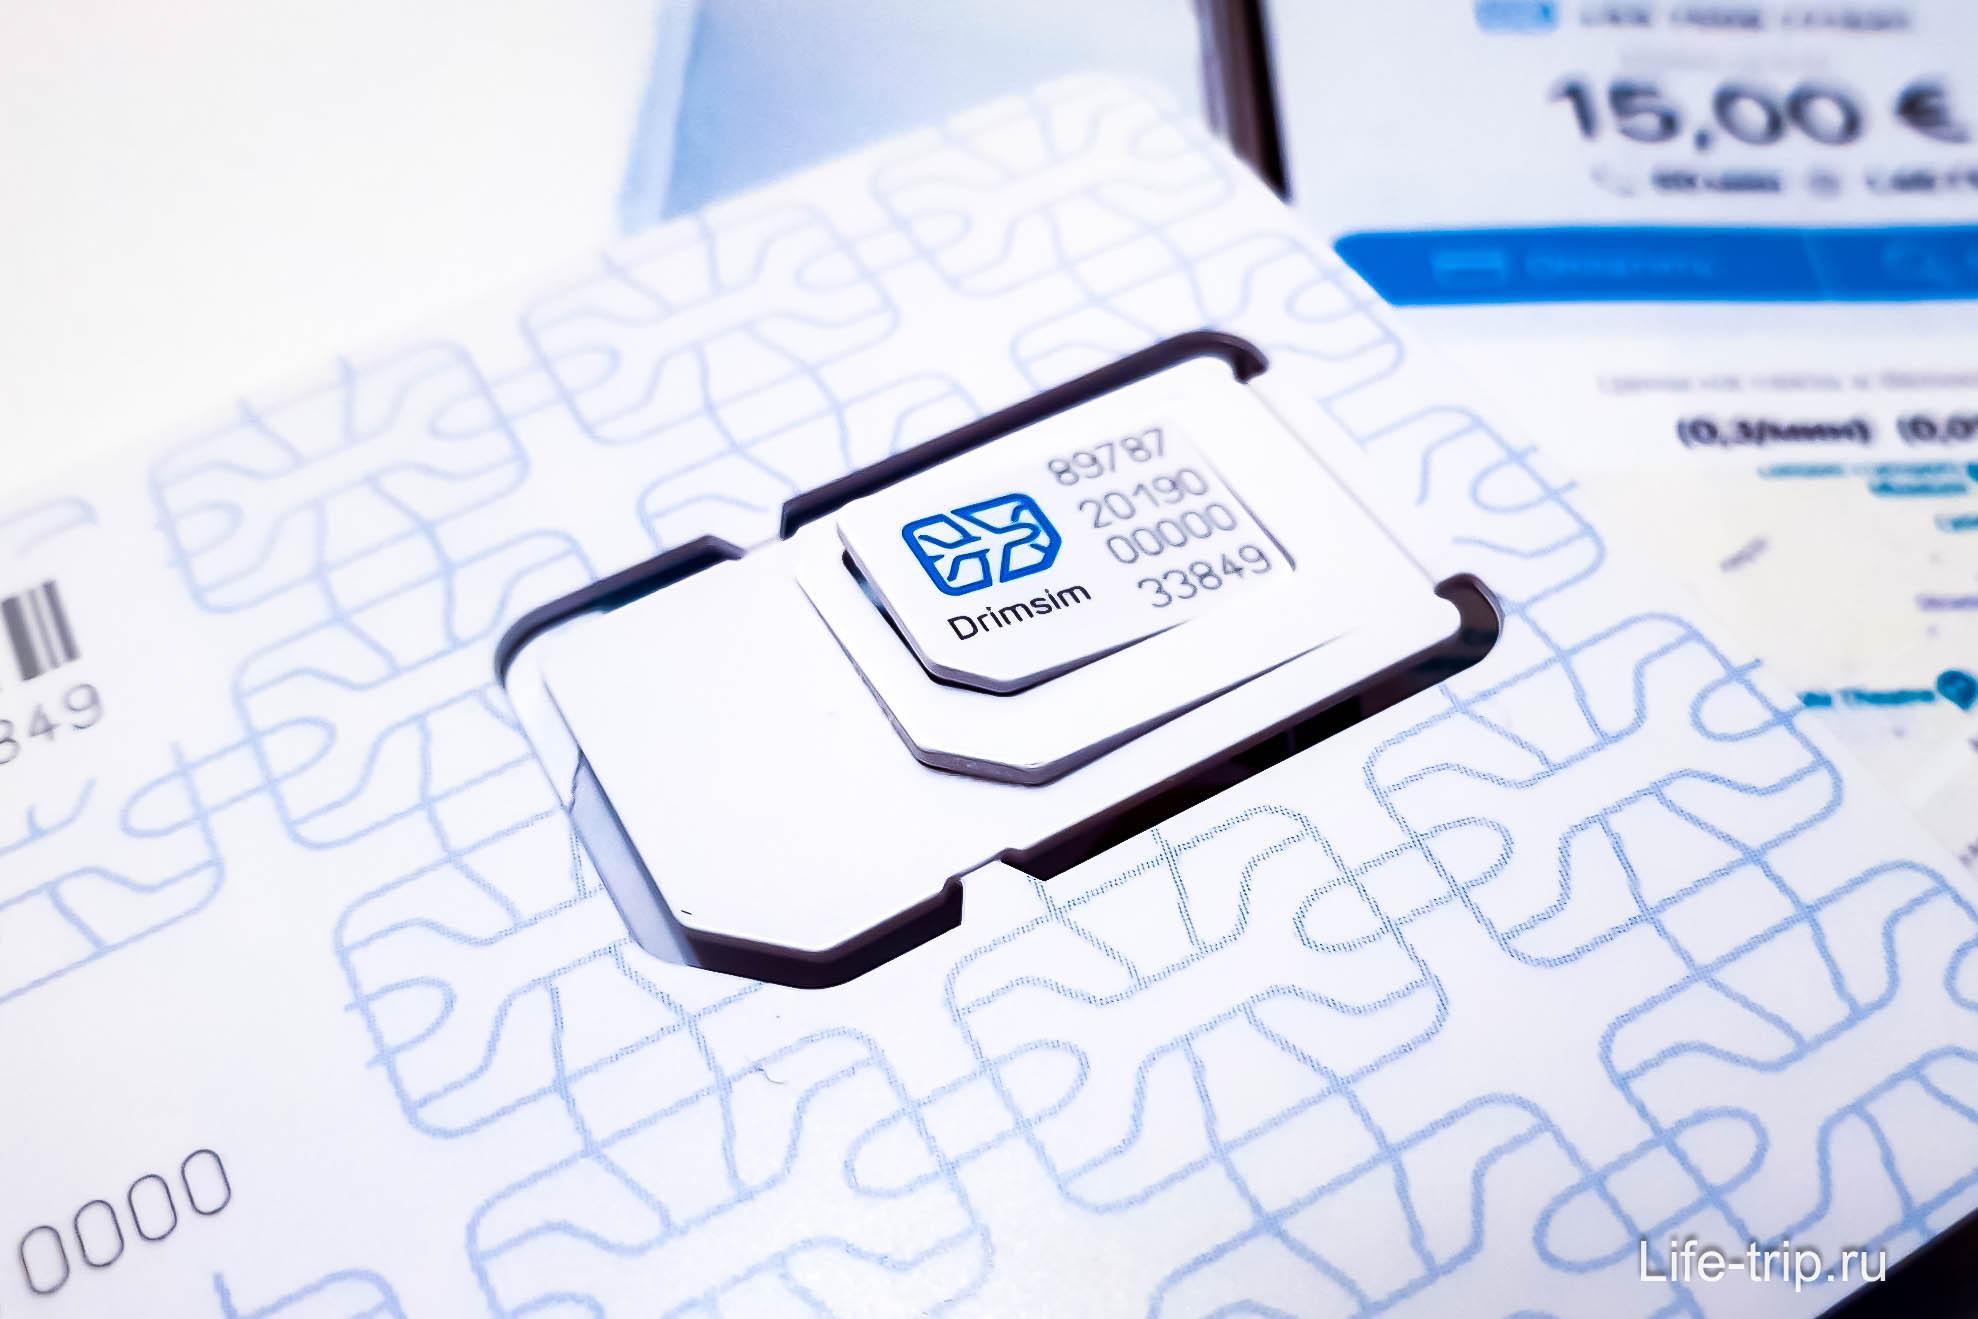 Внутри пакета симка всех размером, включая nano